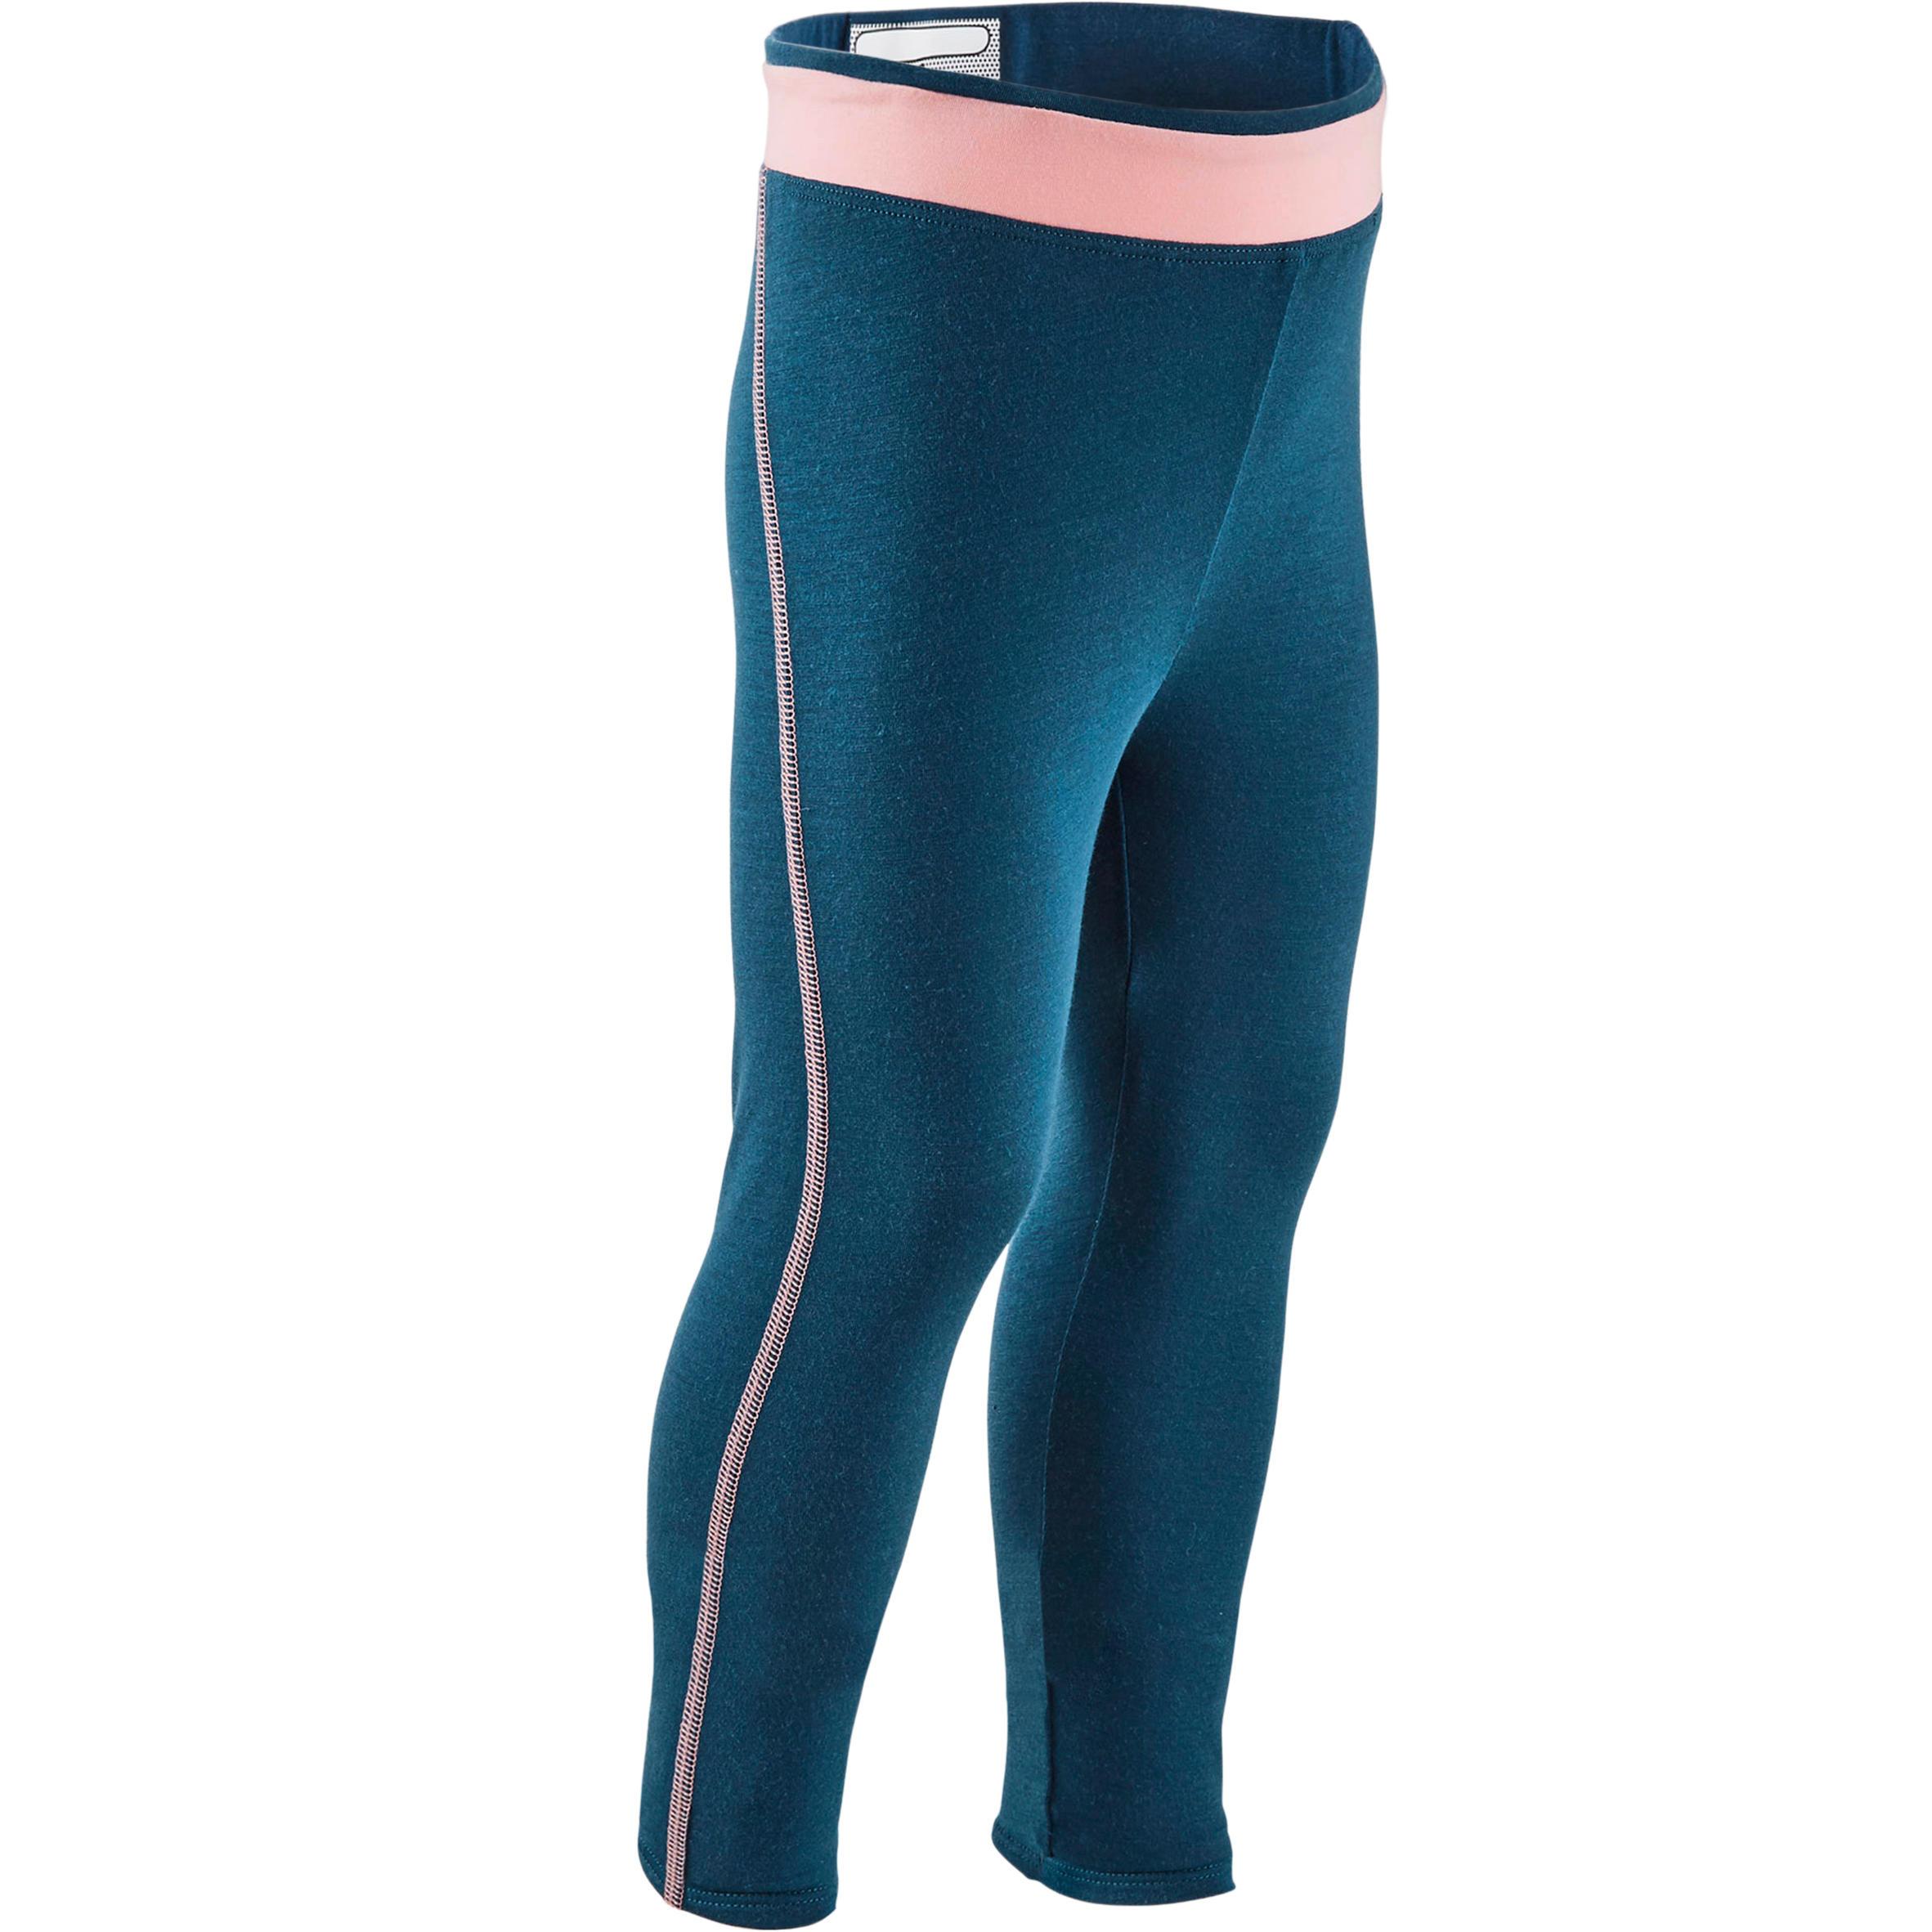 Domyos Legging 500 Baby Gym Fille Bleu petrol/Rose - Domyos